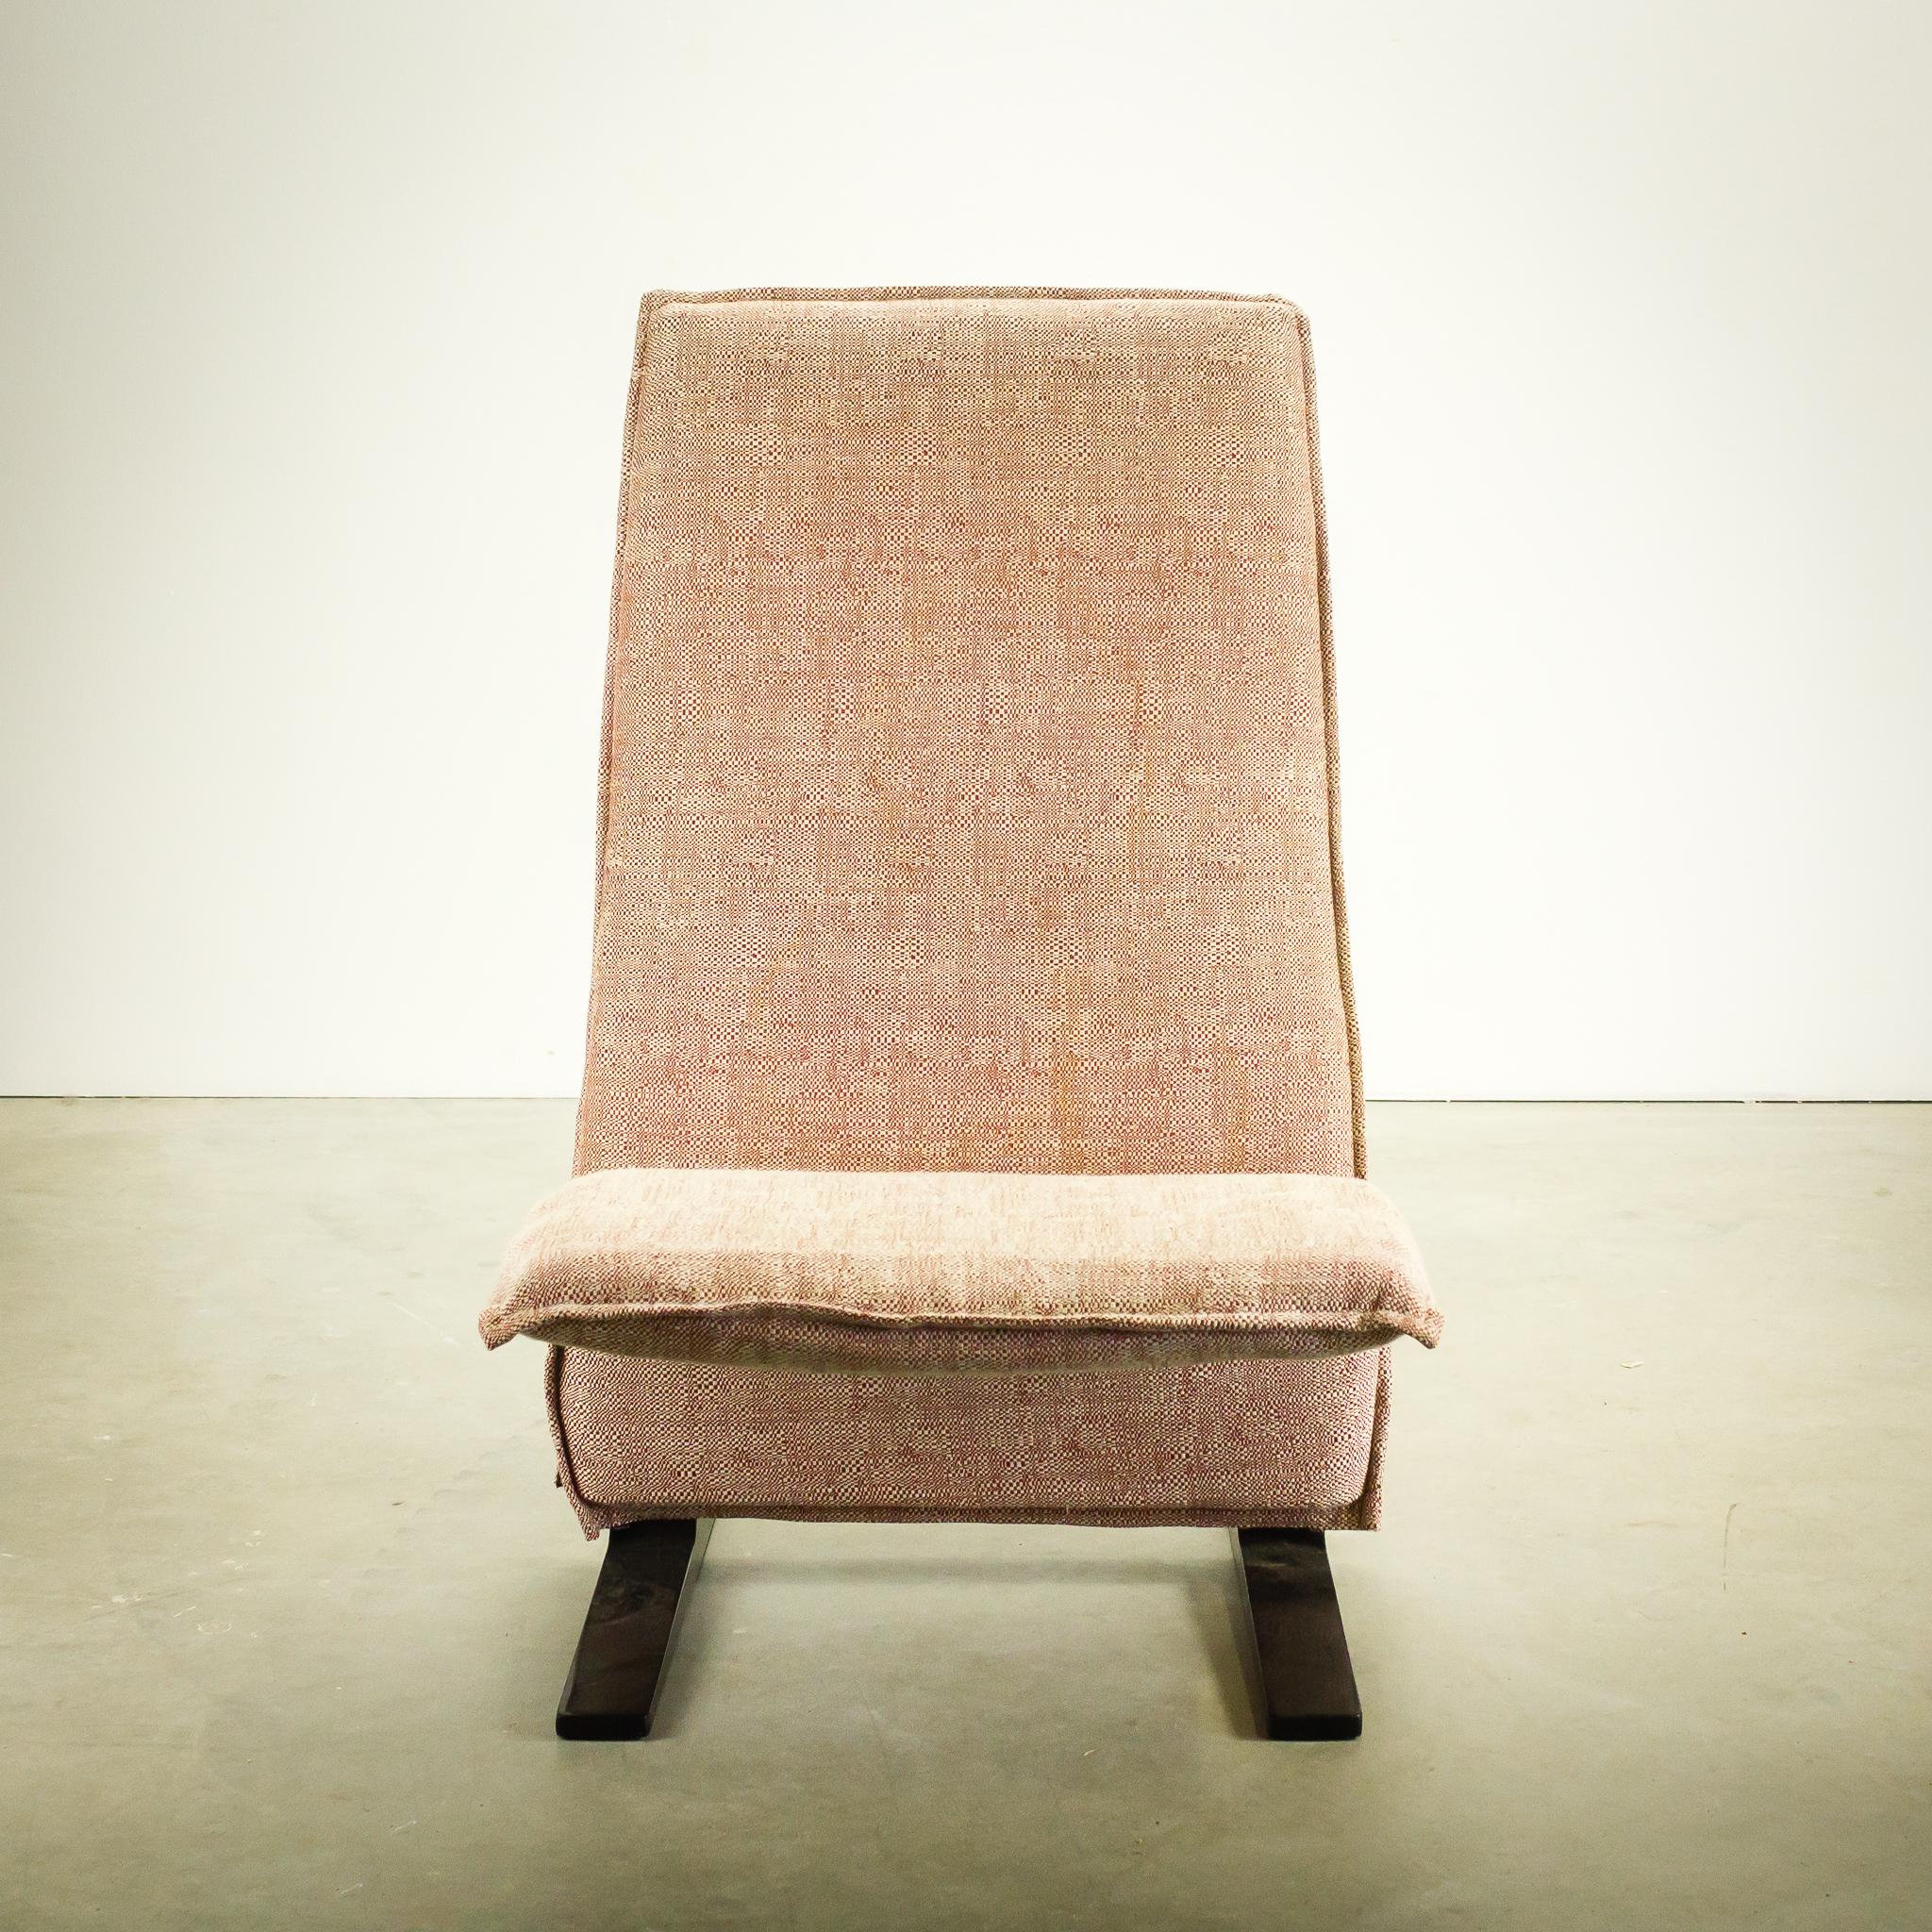 60 s pierre paulin concorde fauteuil artifort set 2 barbmama. Black Bedroom Furniture Sets. Home Design Ideas